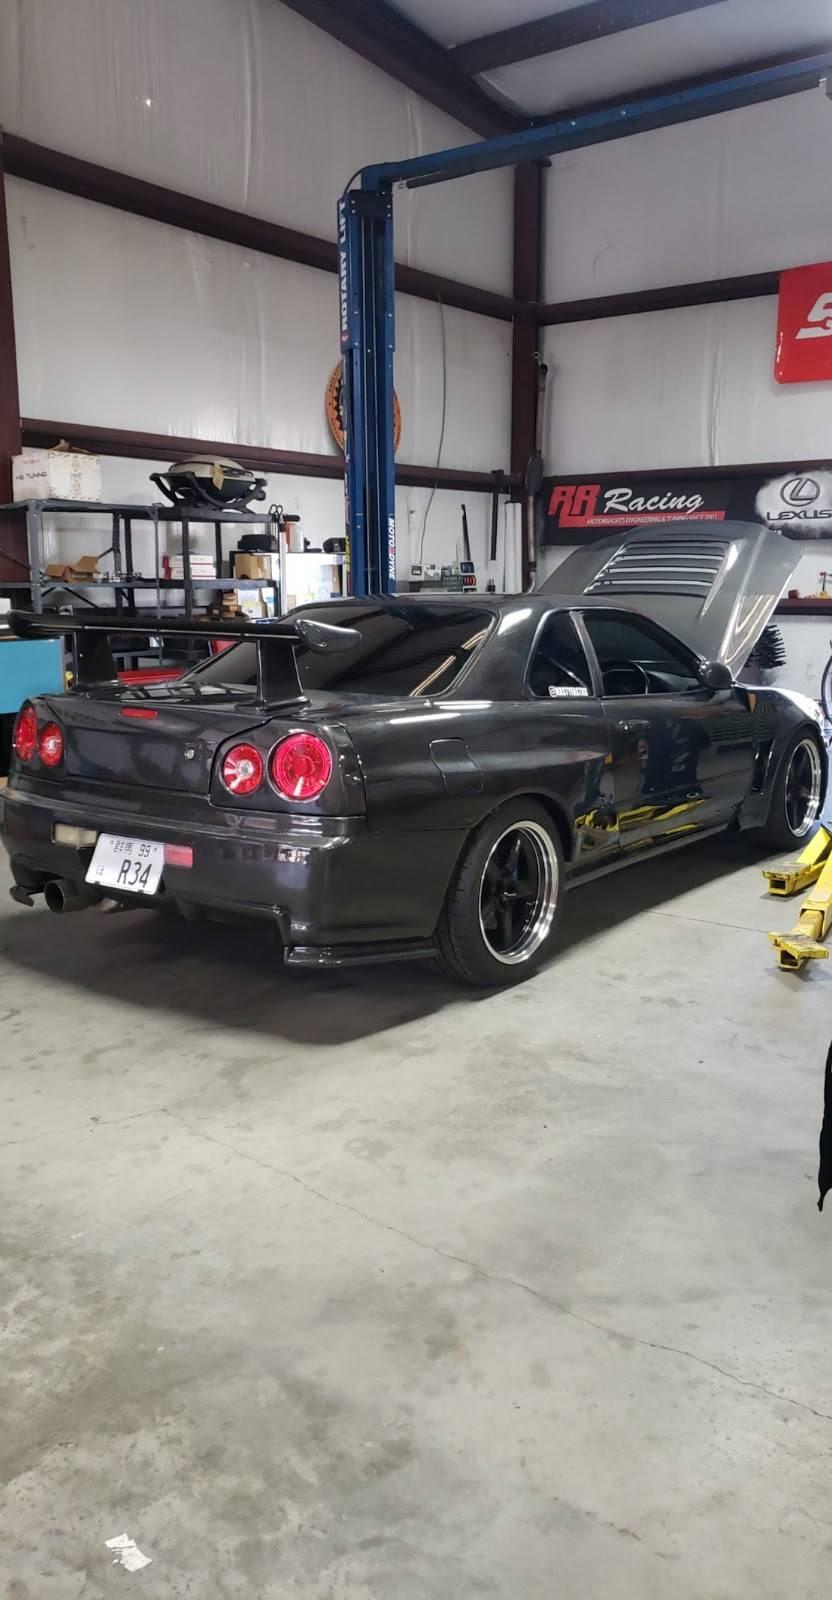 Adrenaline Performance Llc - car repair    Photo 1 of 6   Address: 530 Ellis Rd S #107, Jacksonville, FL 32254, USA   Phone: (904) 619-5370